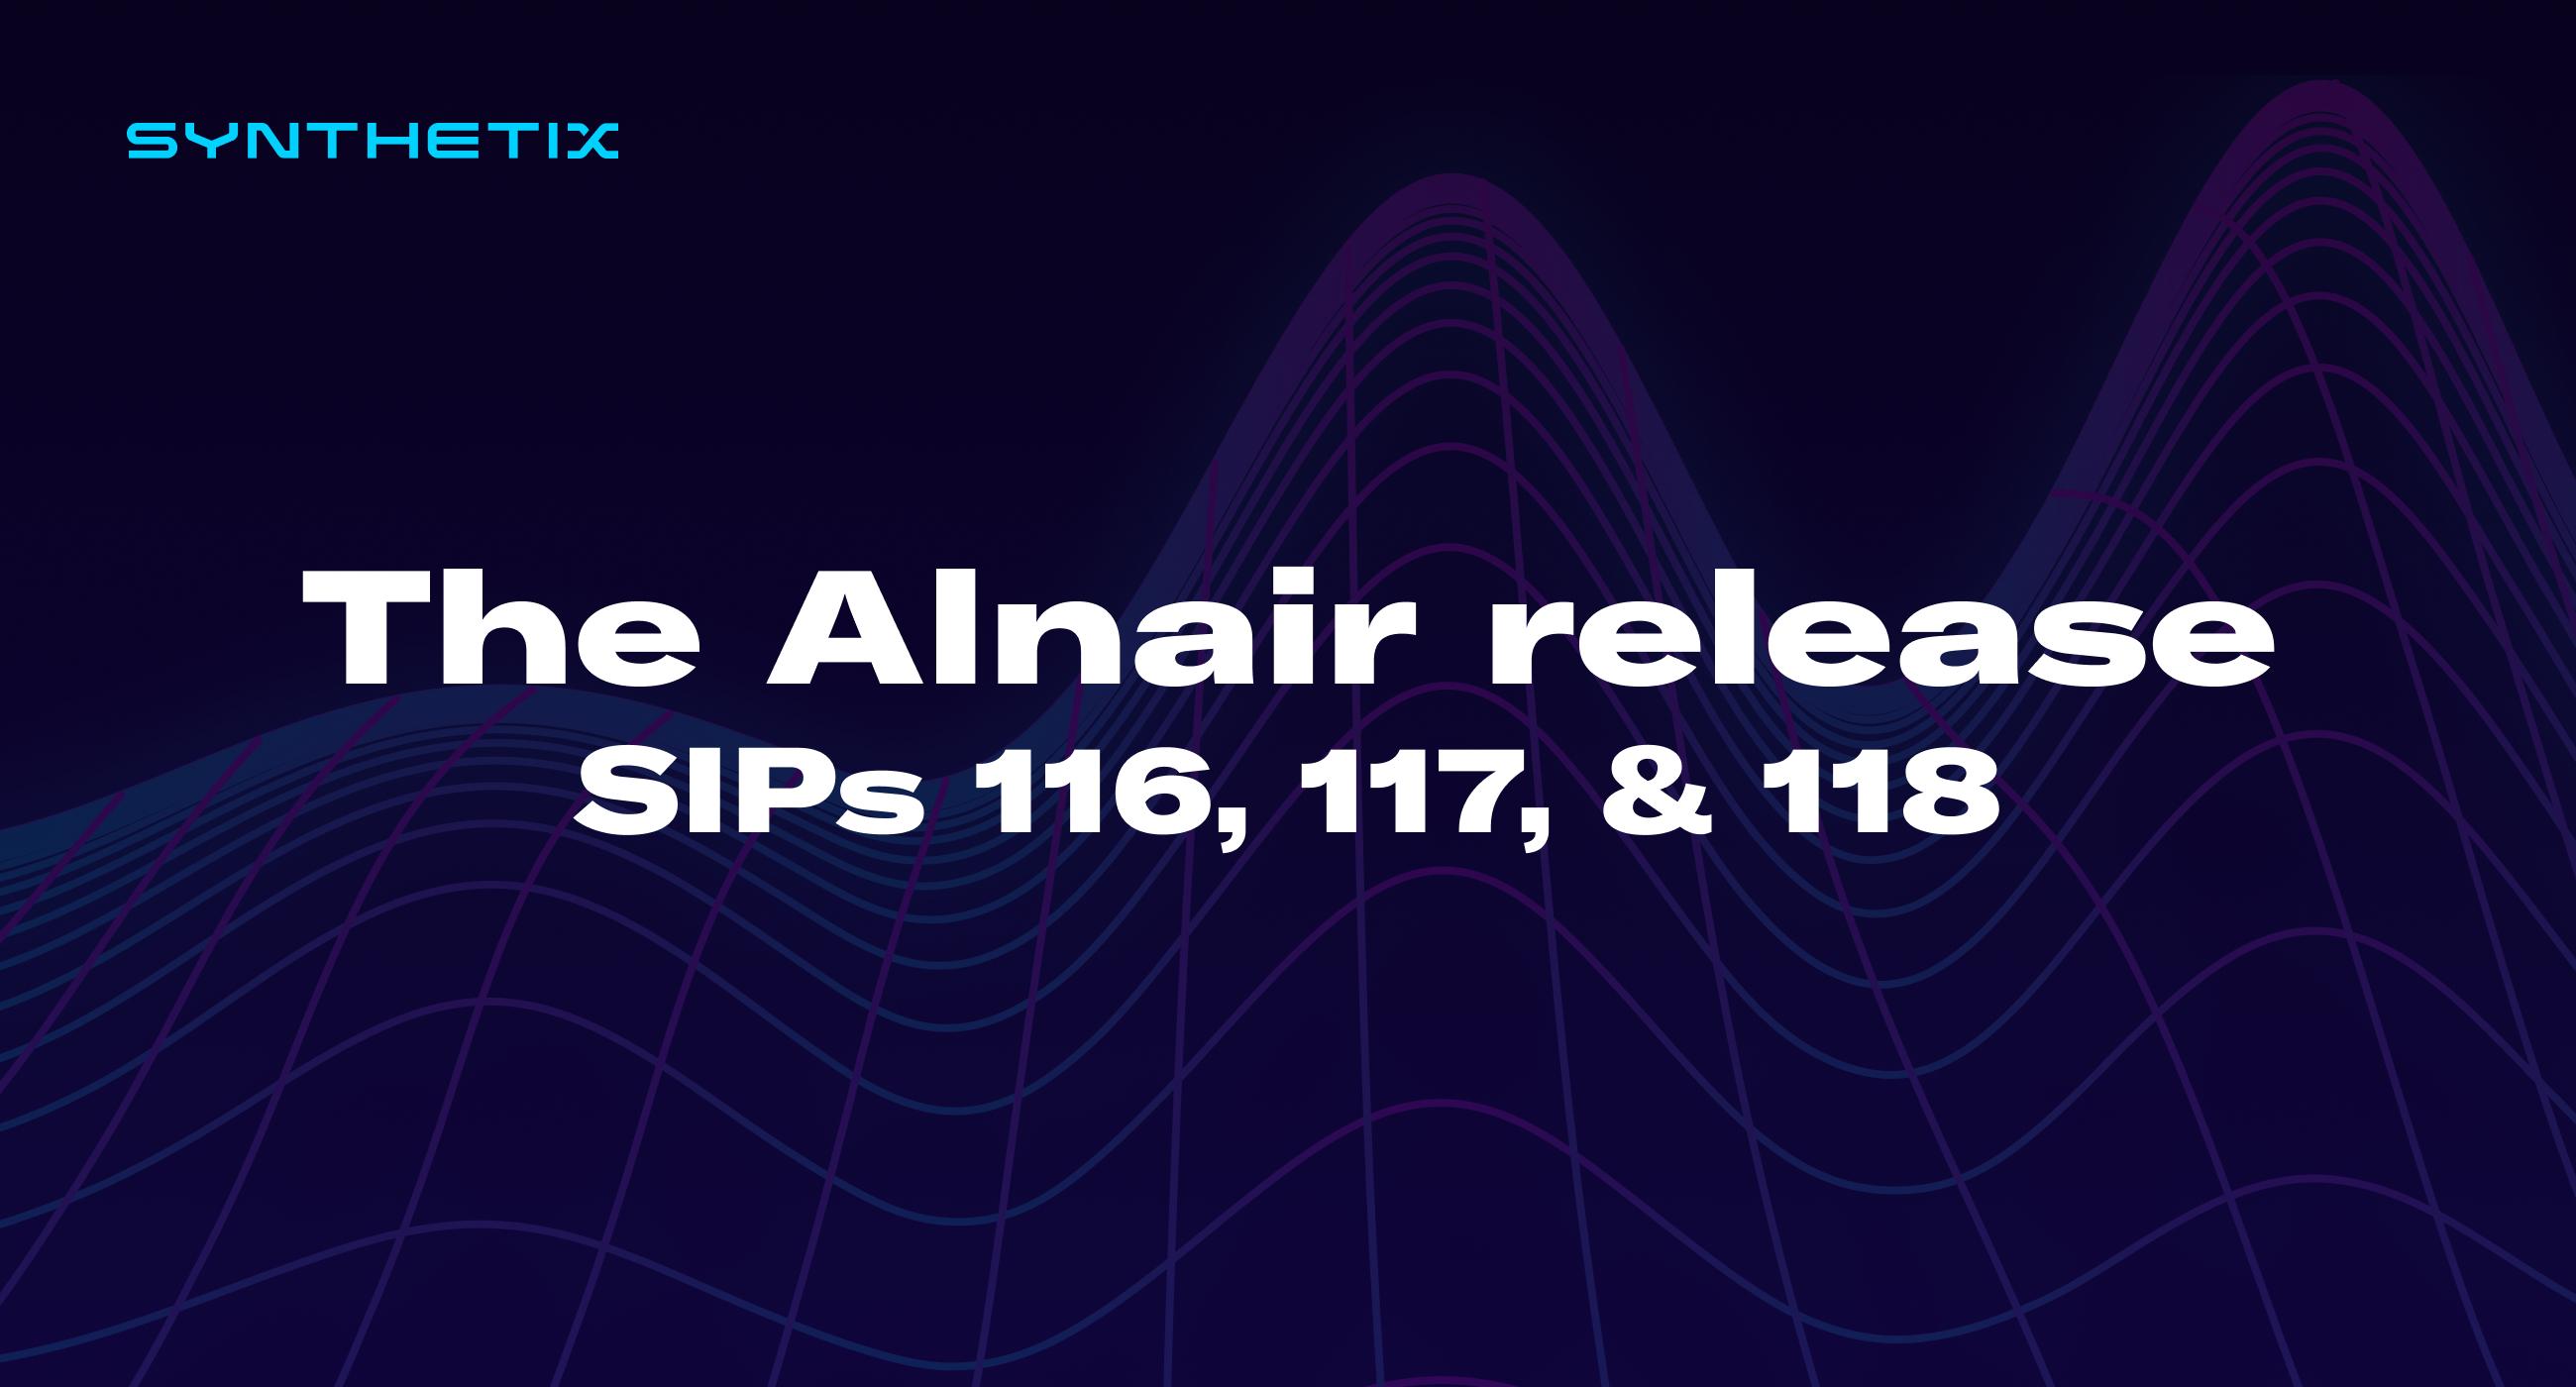 The Alnair release